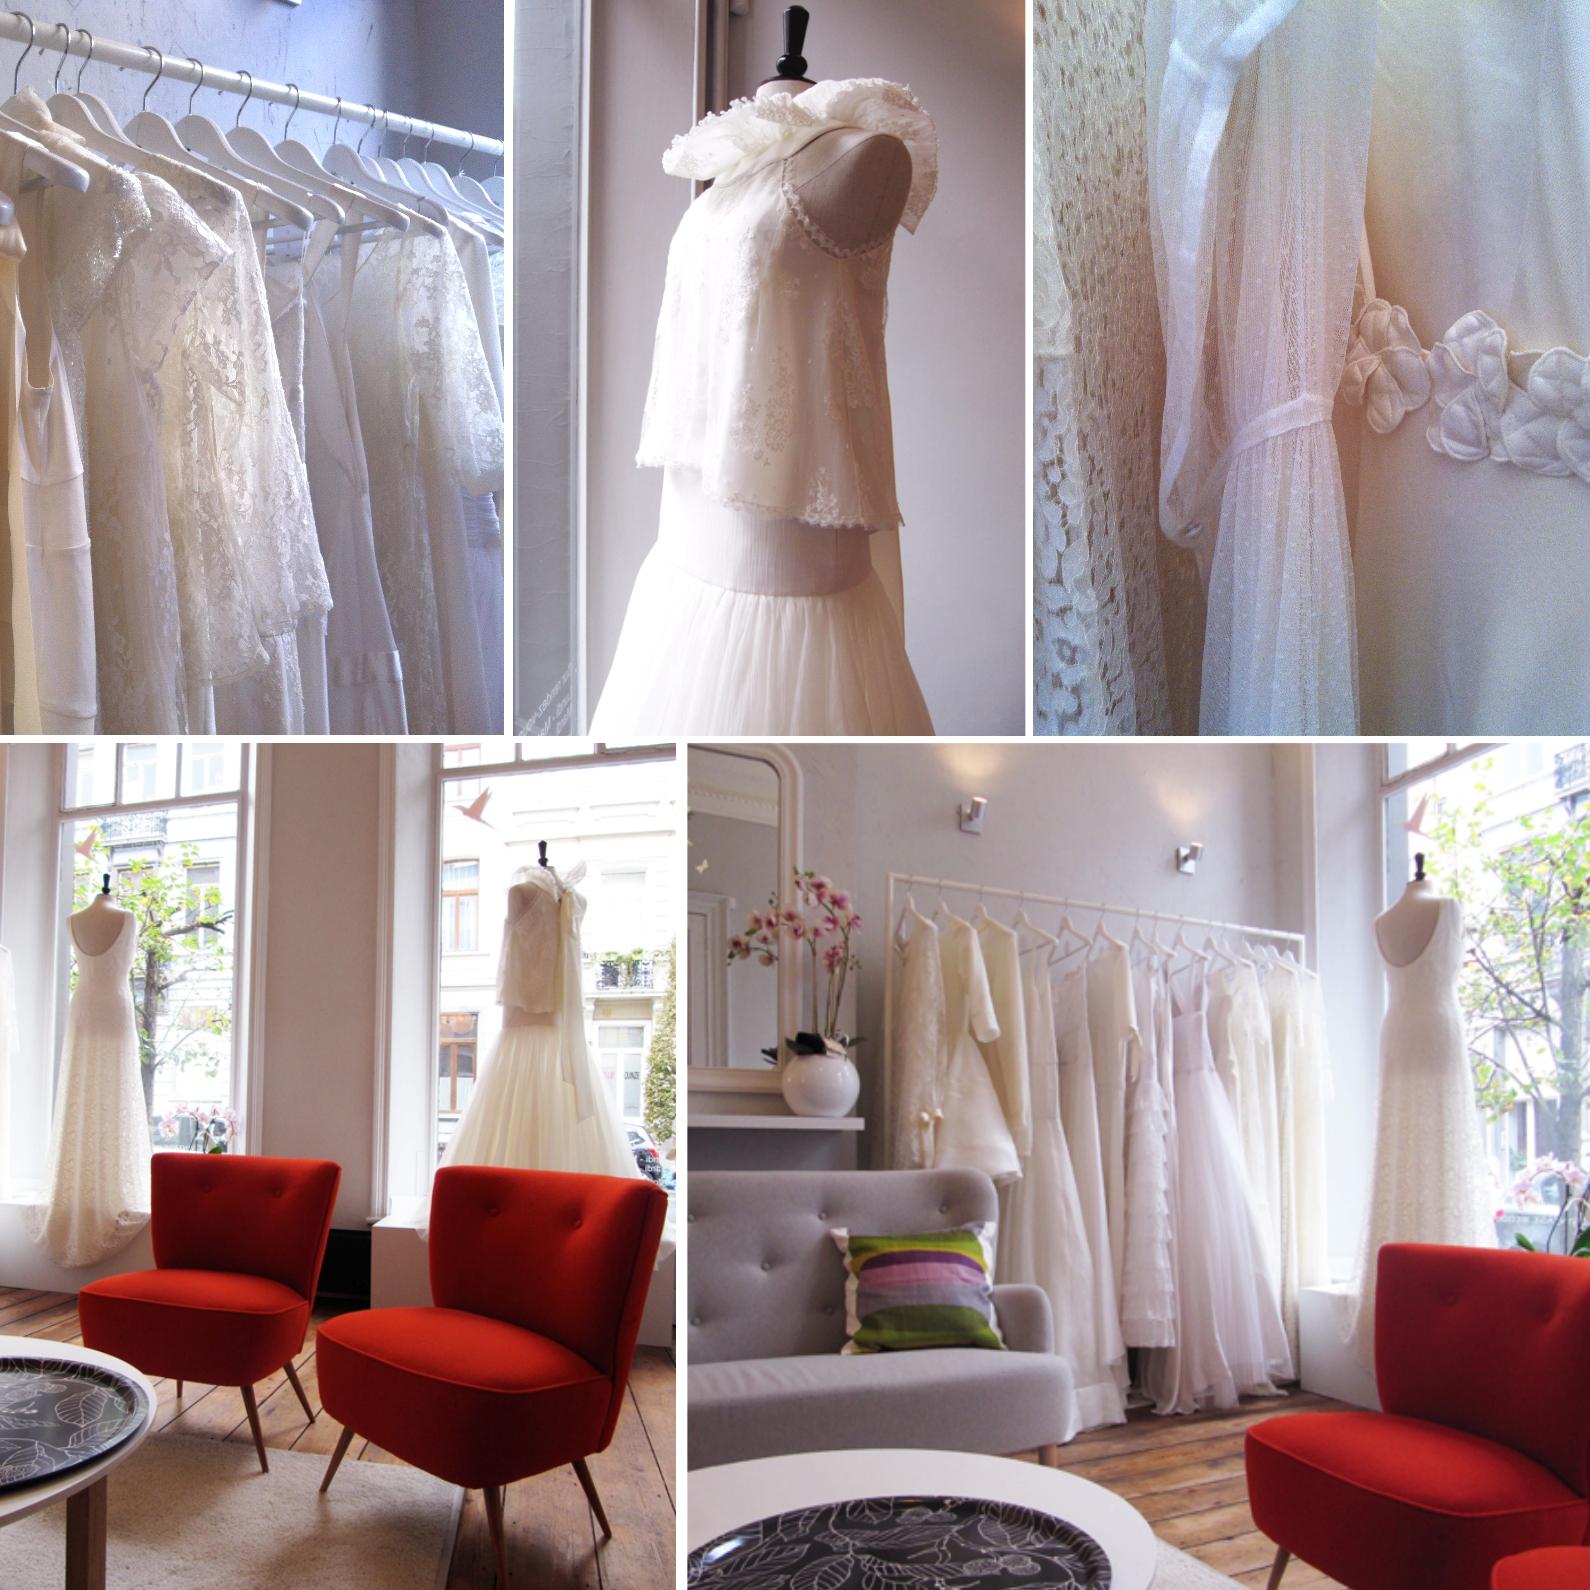 lovesweetetc_ambiance boutique